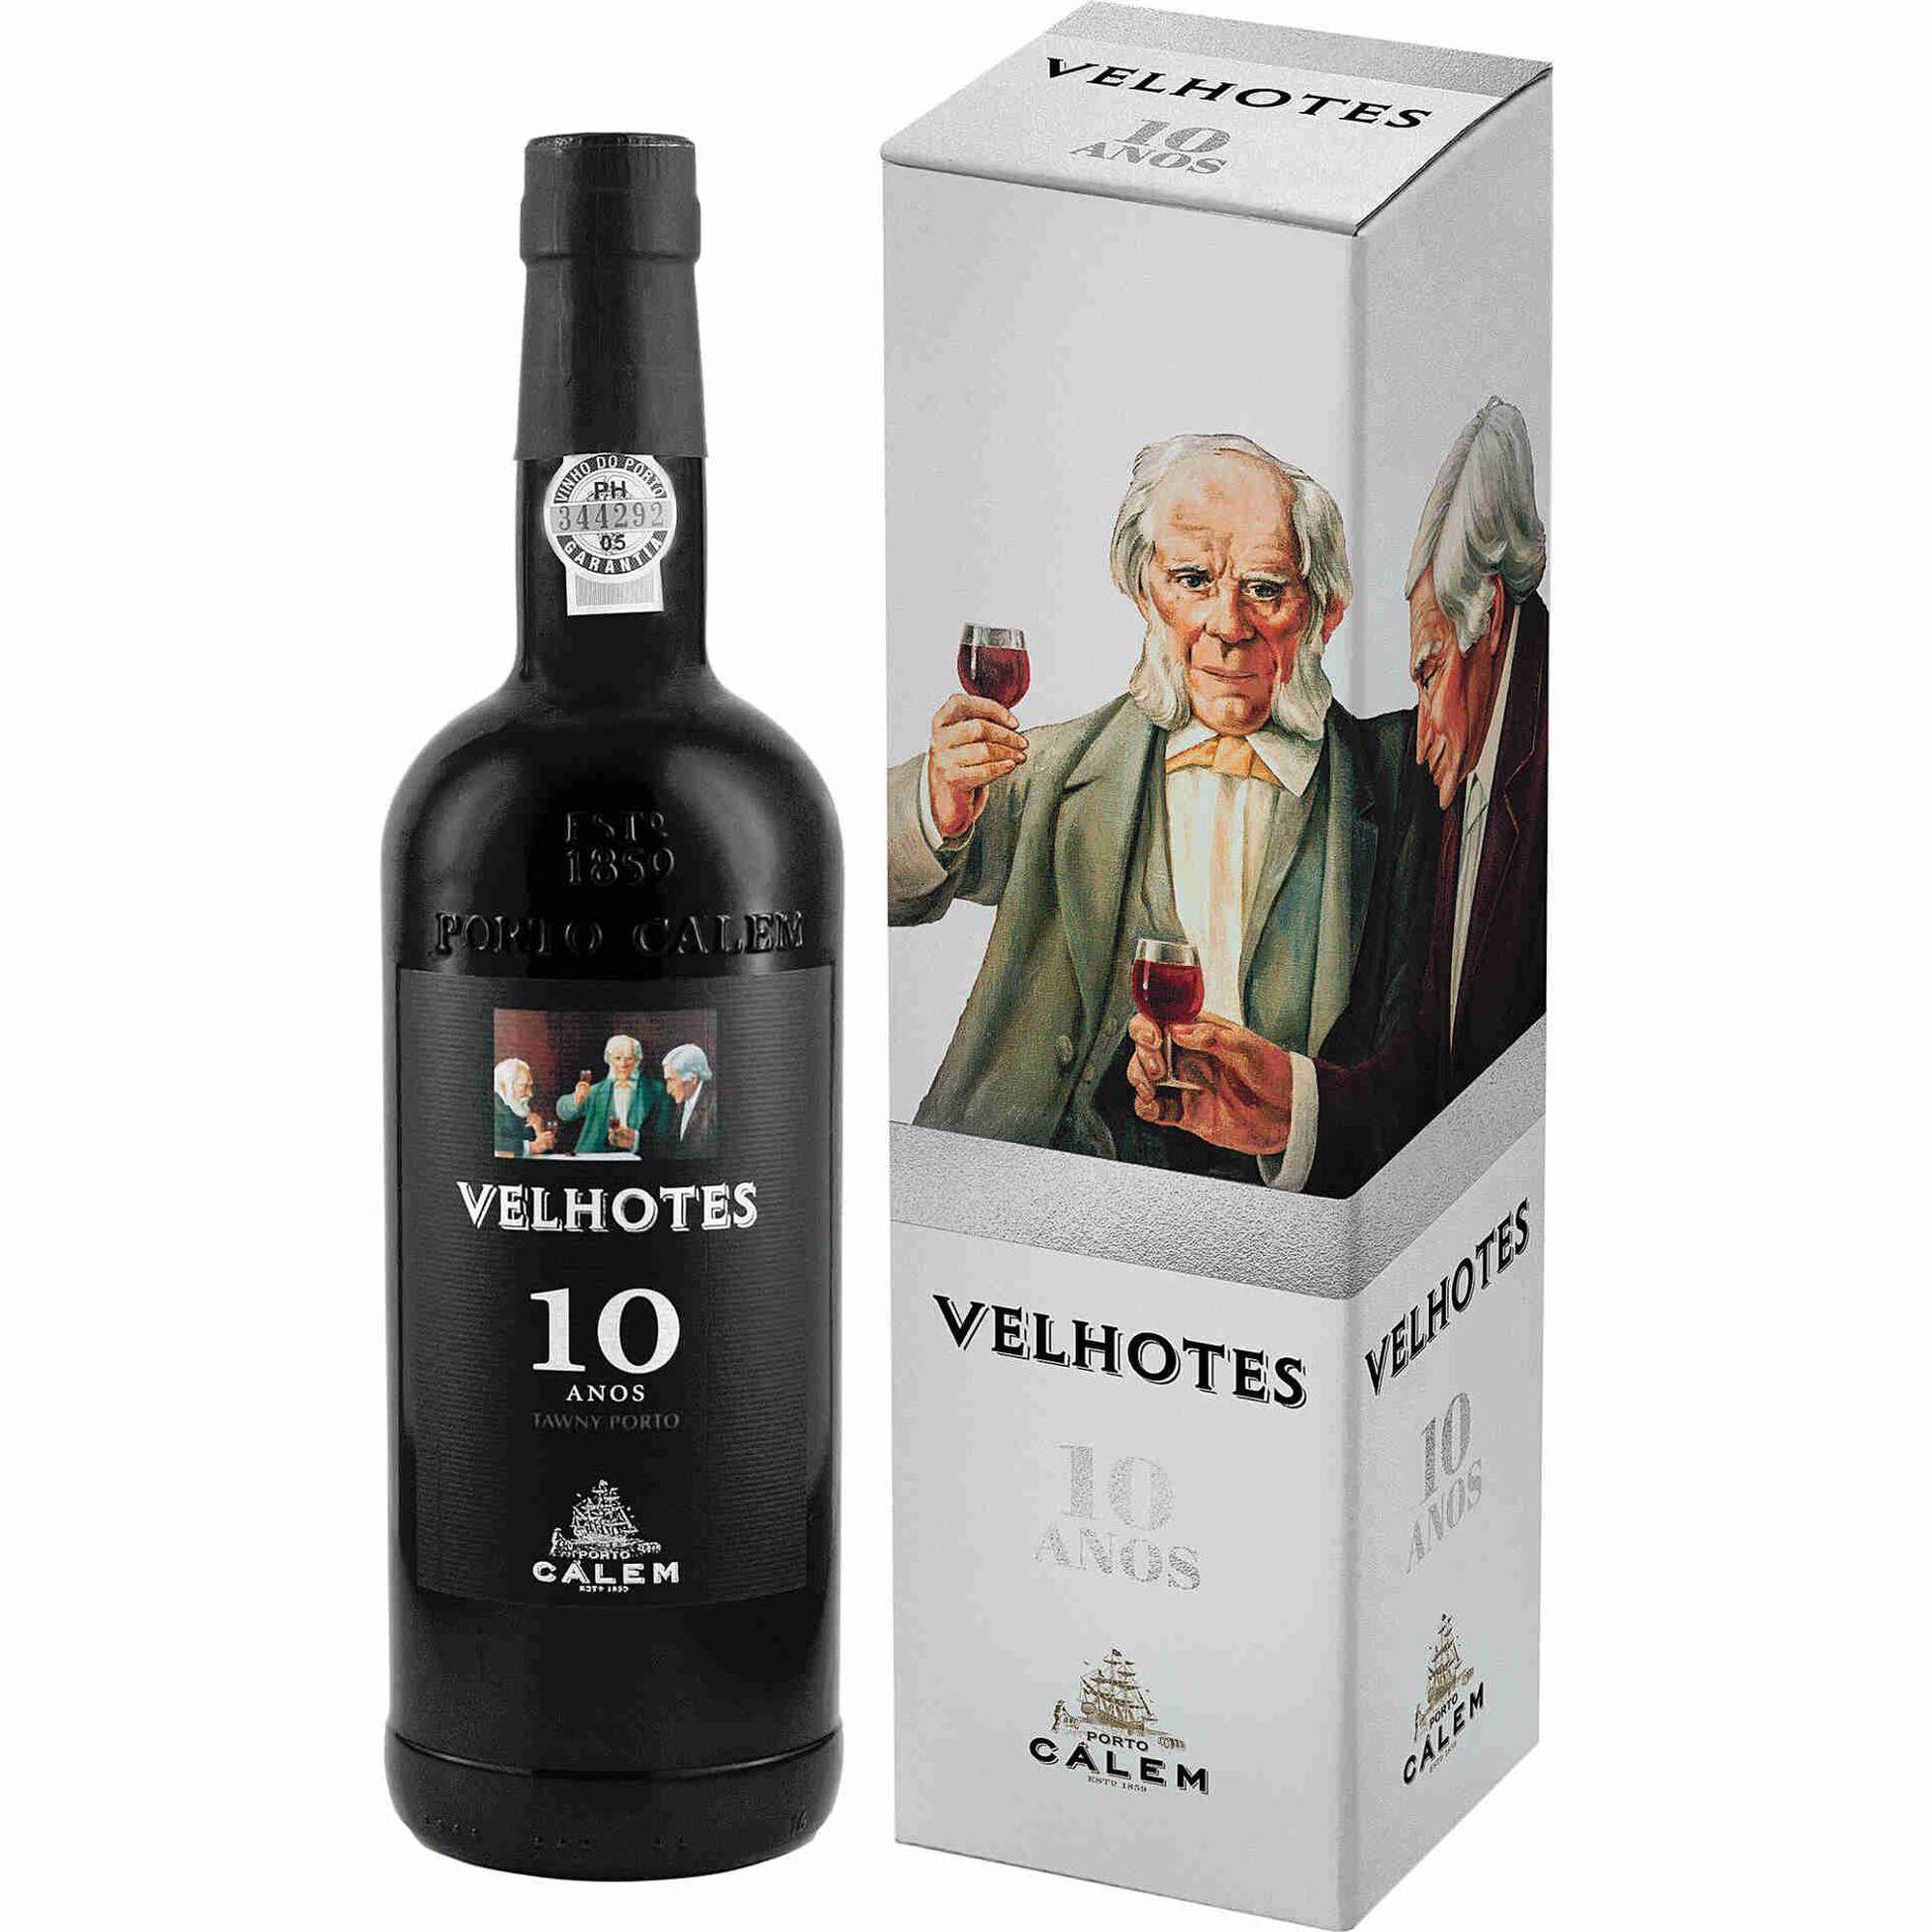 Cálem Velhotes Vinho do Porto 10 Anos